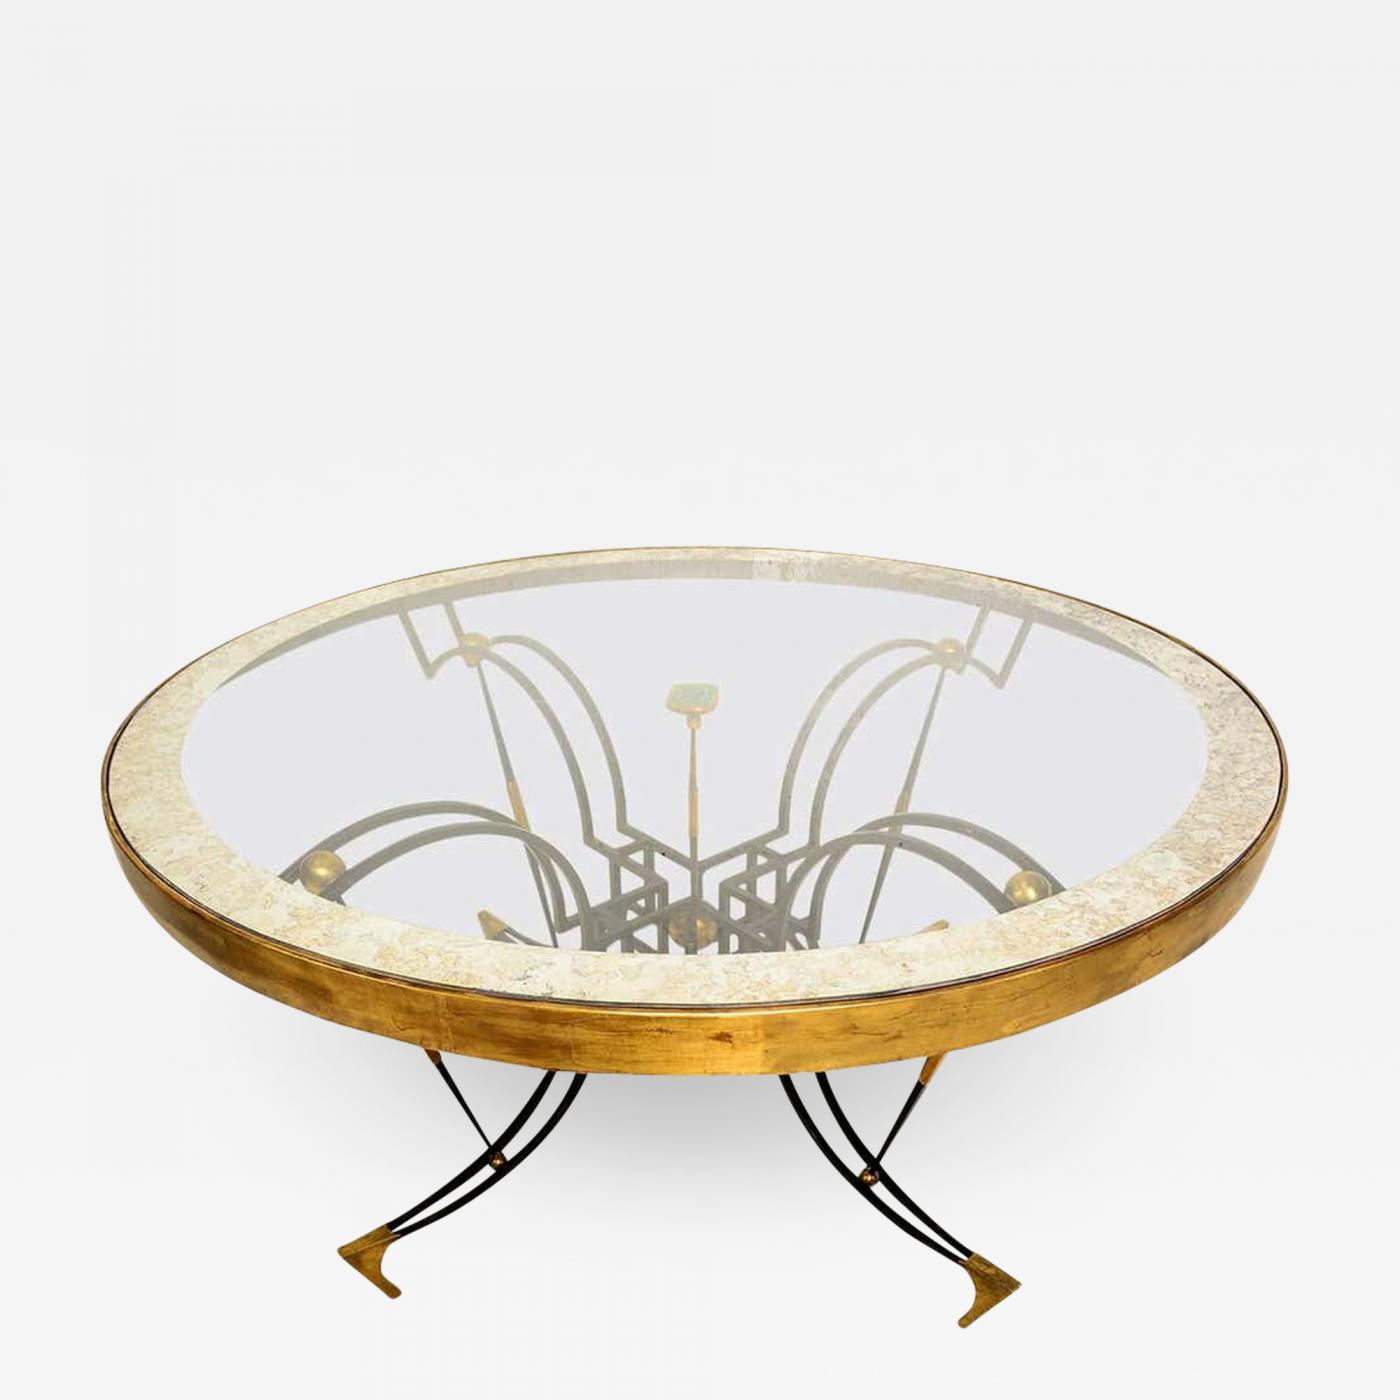 Arturo Pani Arturo Pani Divine Dining Table Sculpted Bronze Antique Glass Stunning Malachite